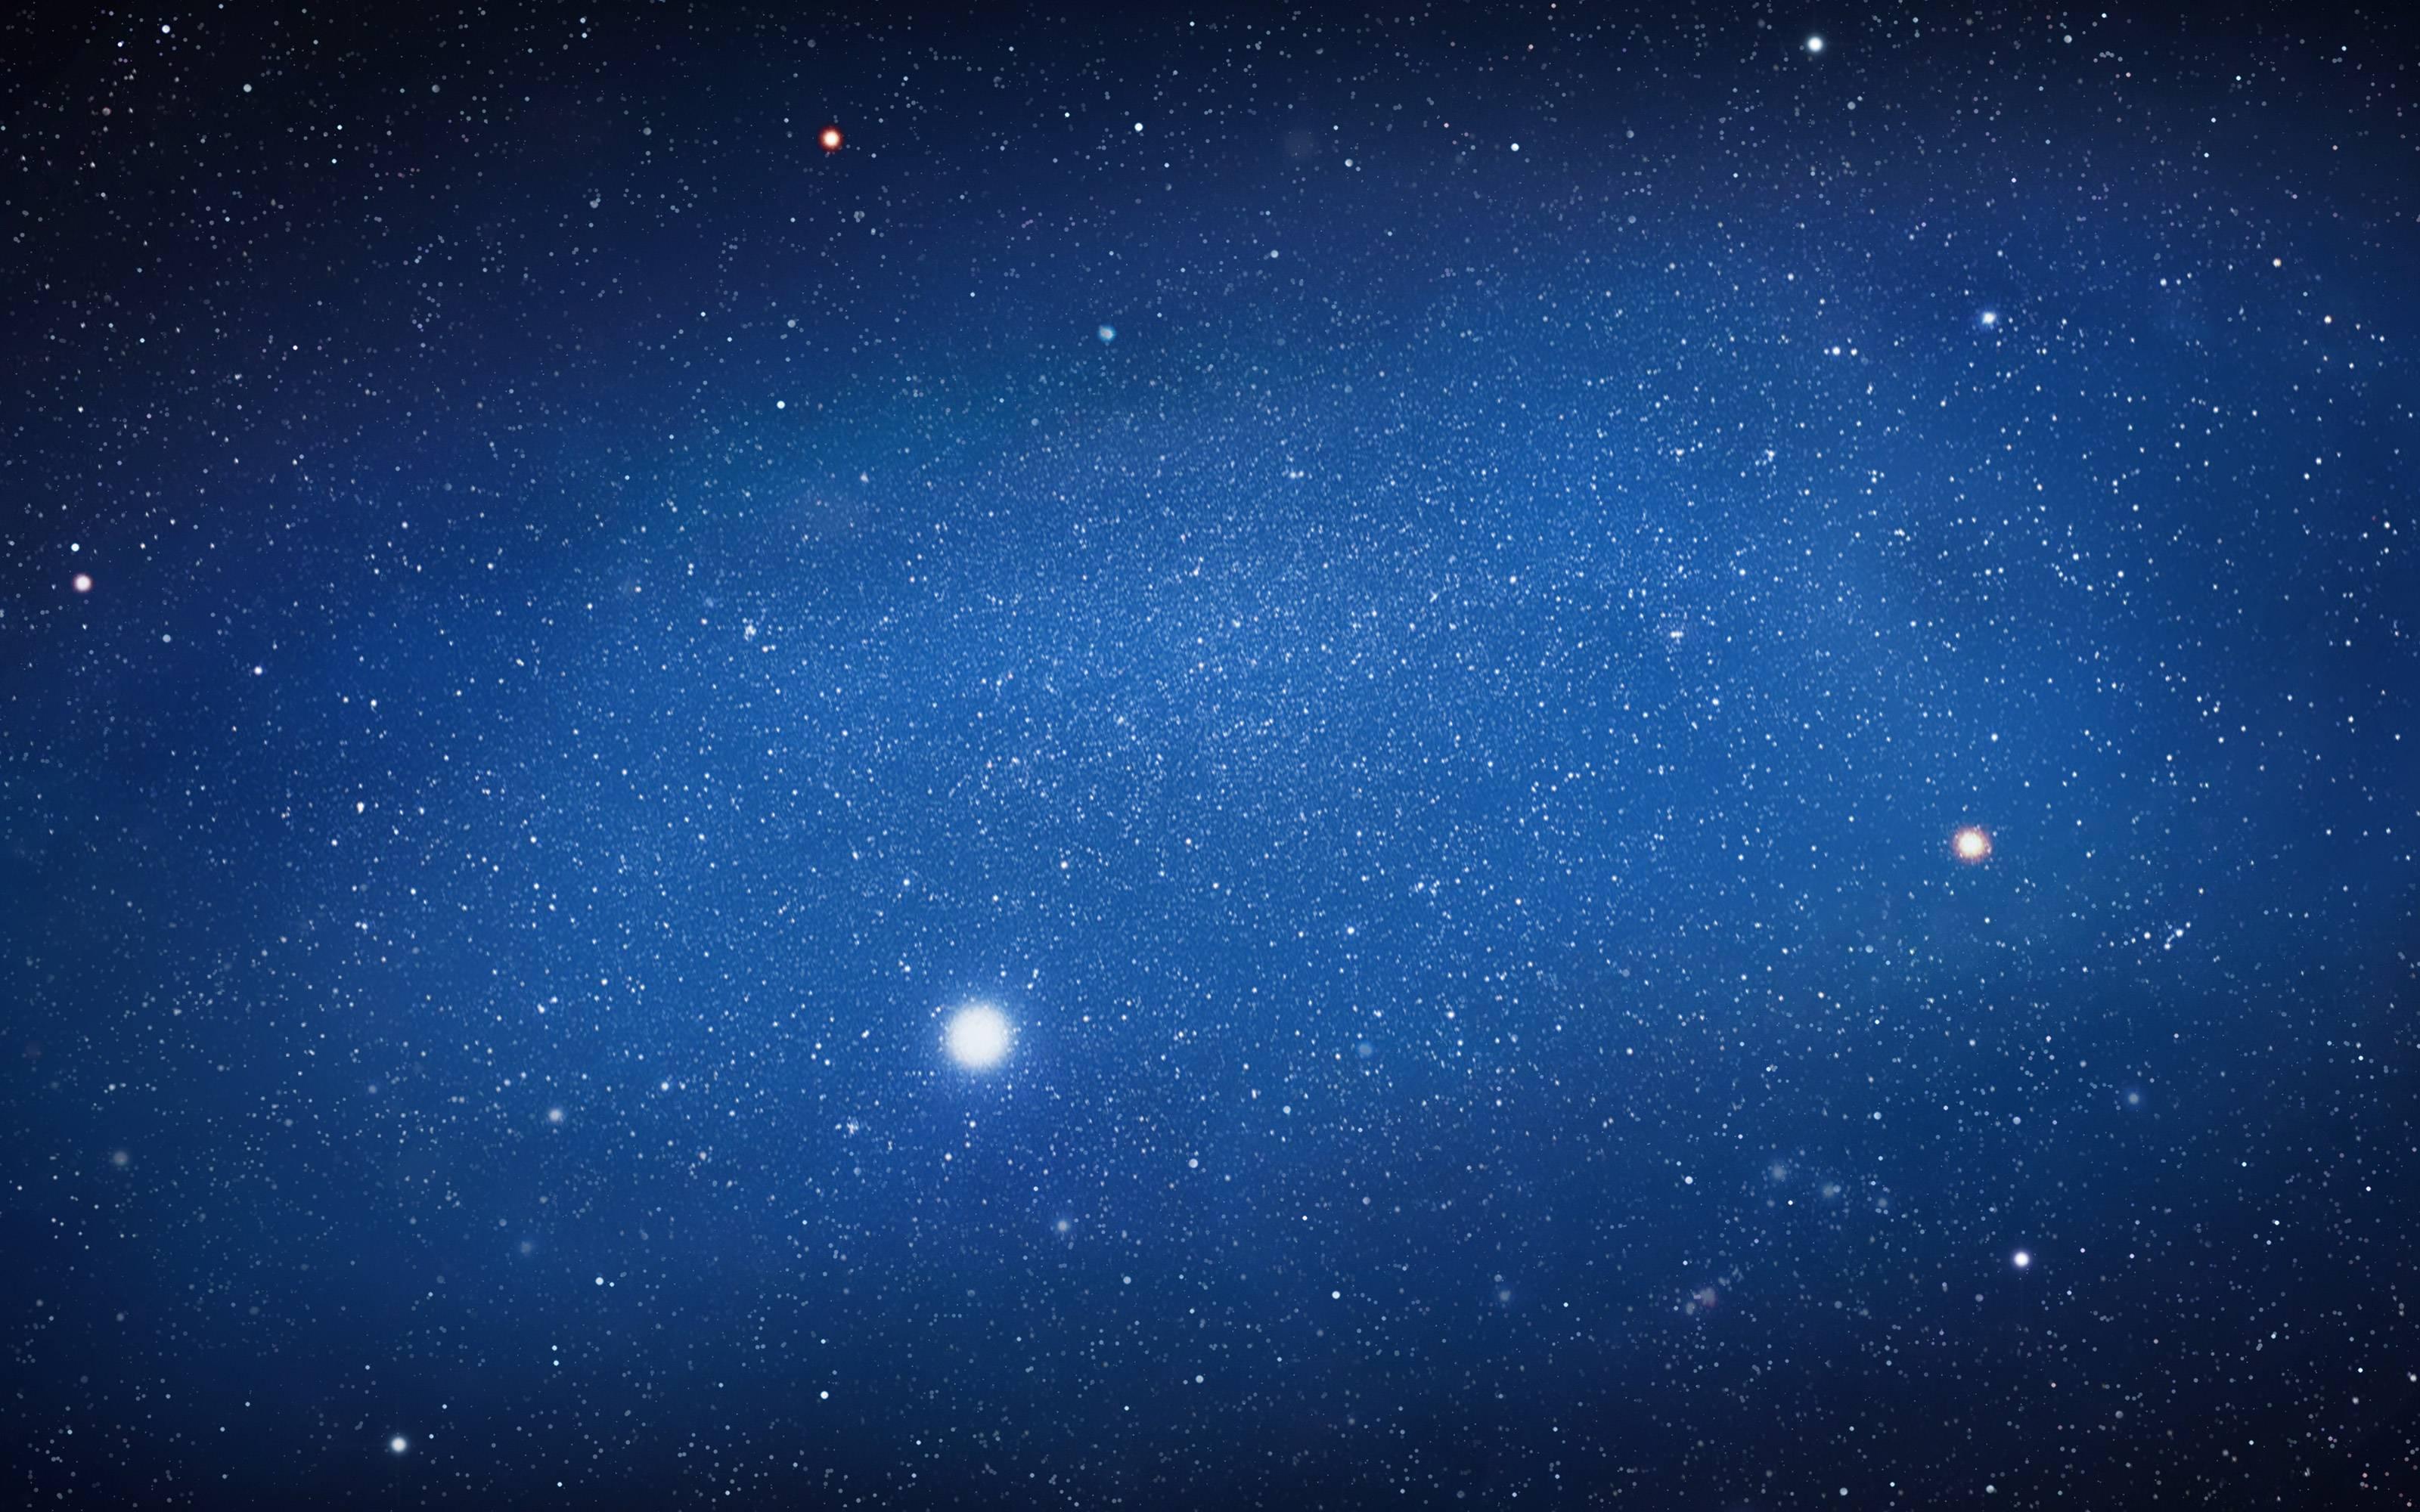 Wallpaper clipart night sky And stars night Sky at